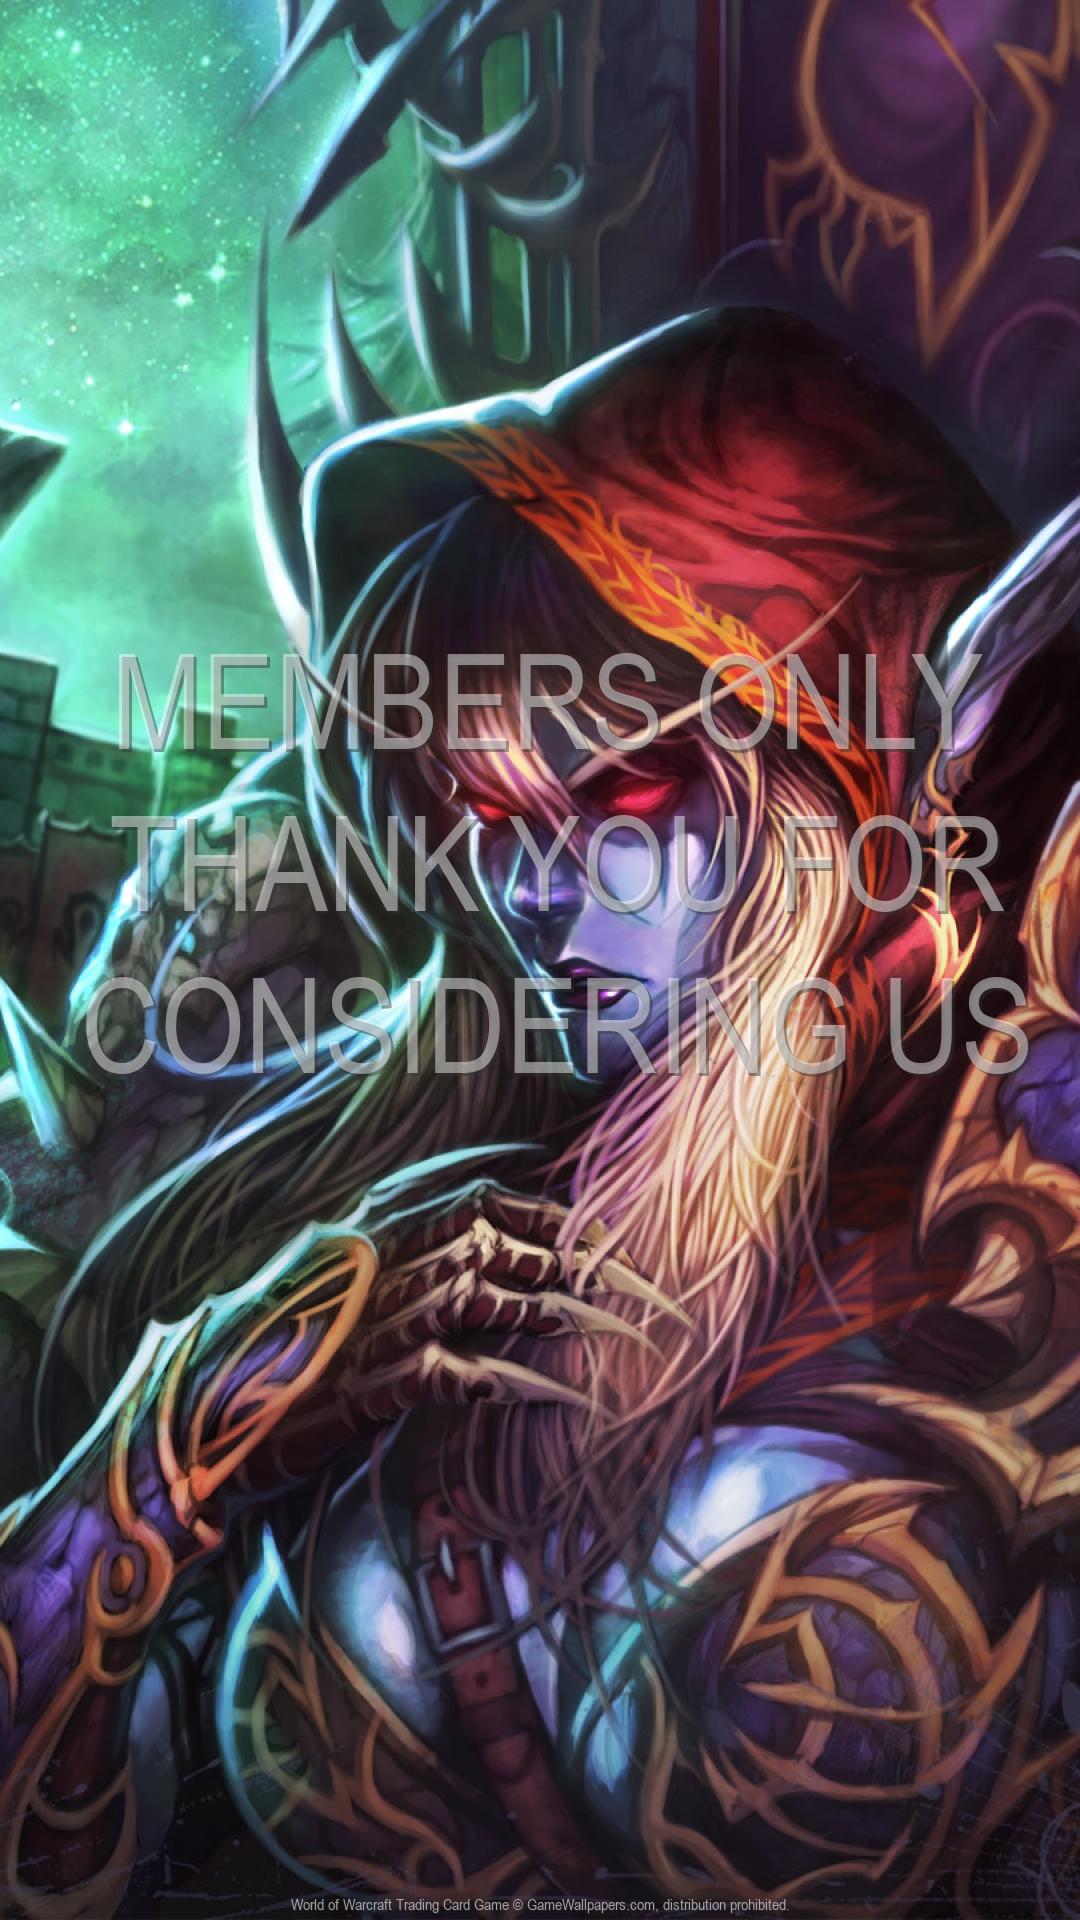 World of Warcraft: Trading Card Game 1920x1080 Handy Hintergrundbild 51